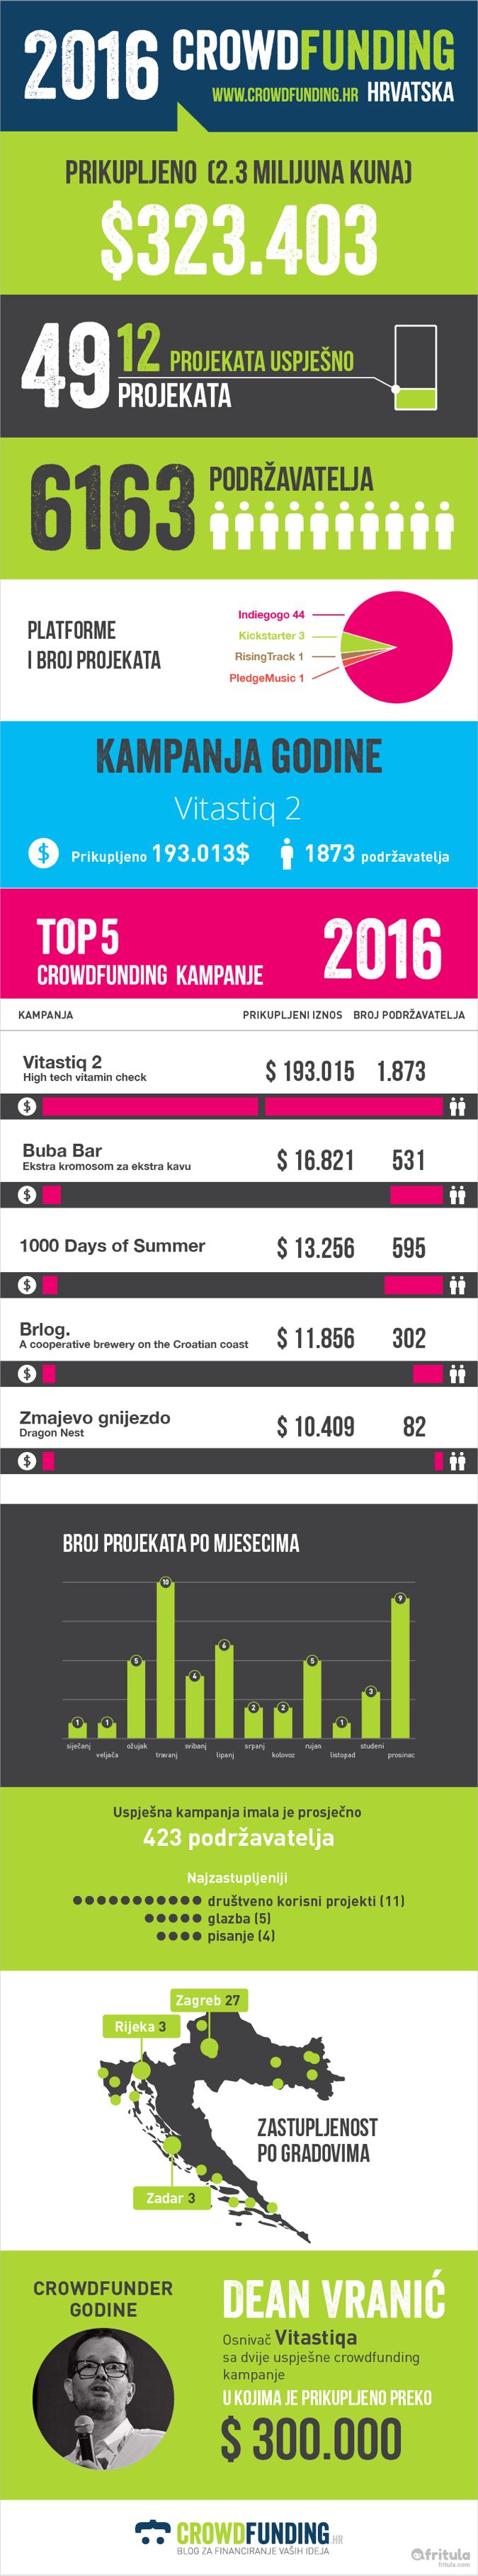 crowdfunding_infografika_2016